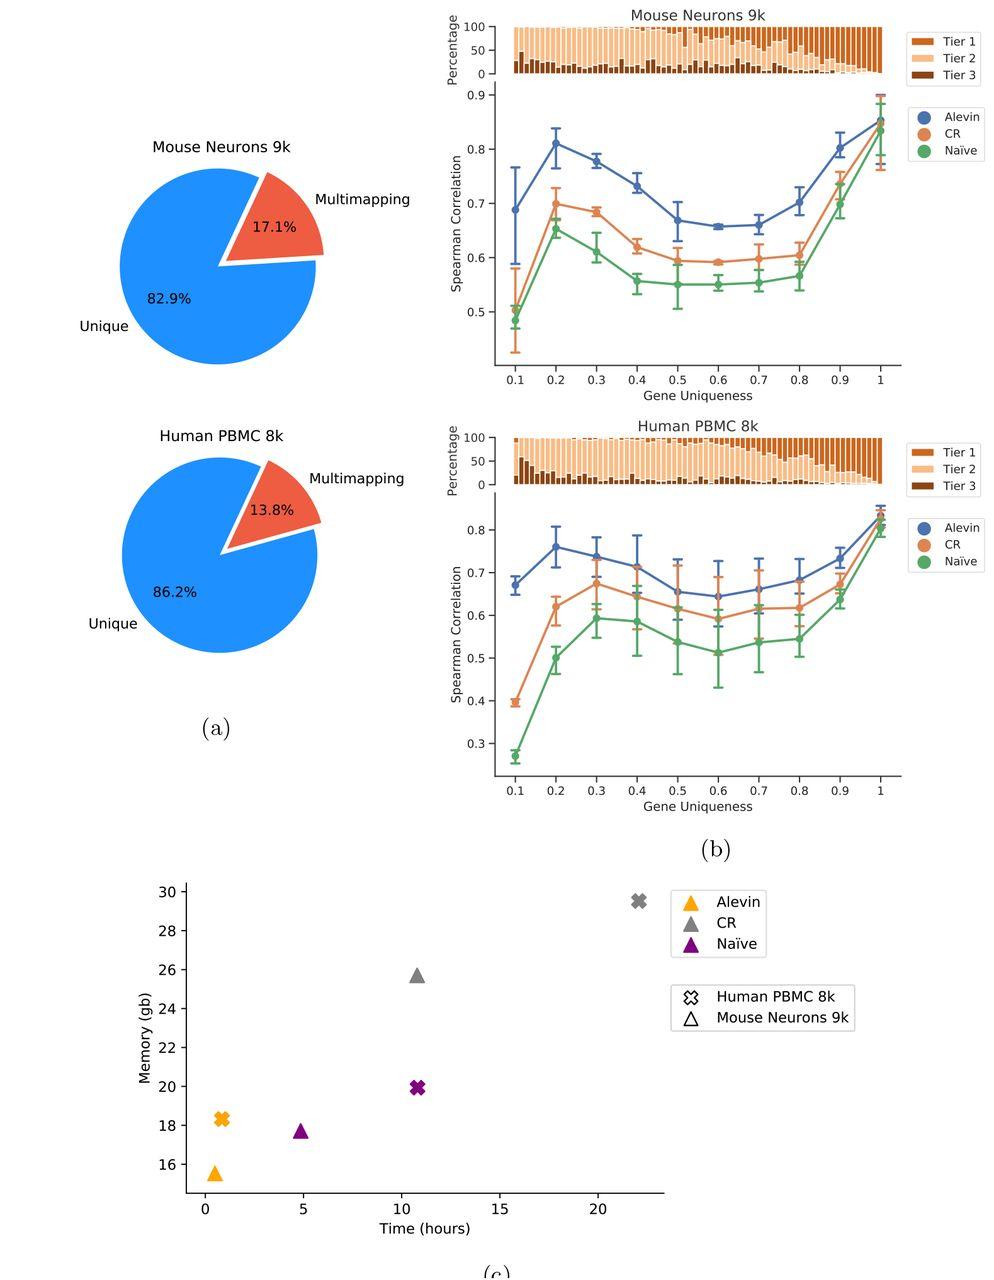 Alevin efficiently estimates accurate gene abundances from